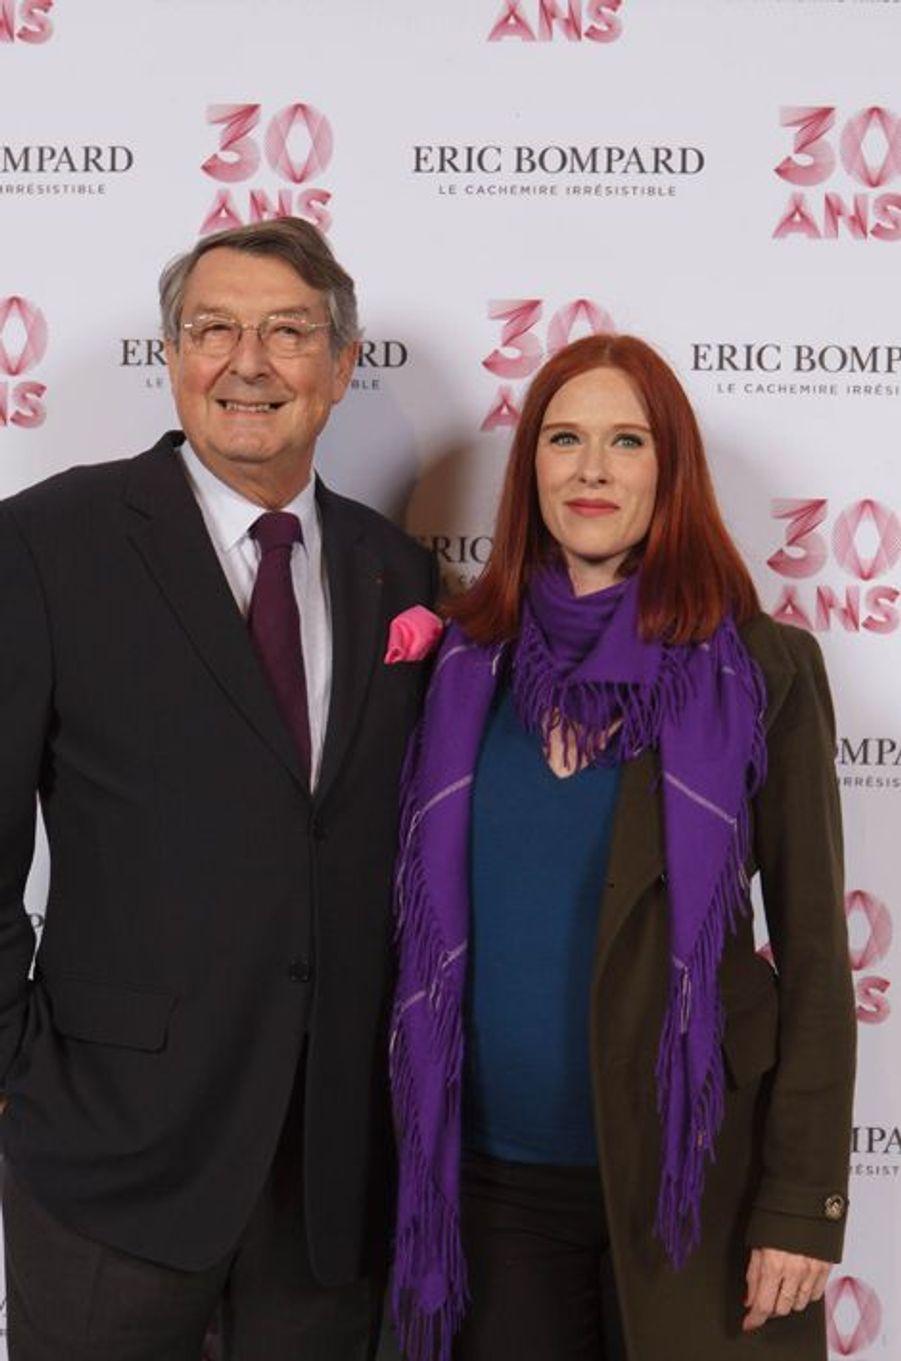 Eric Bompard et Audrey Fleurot